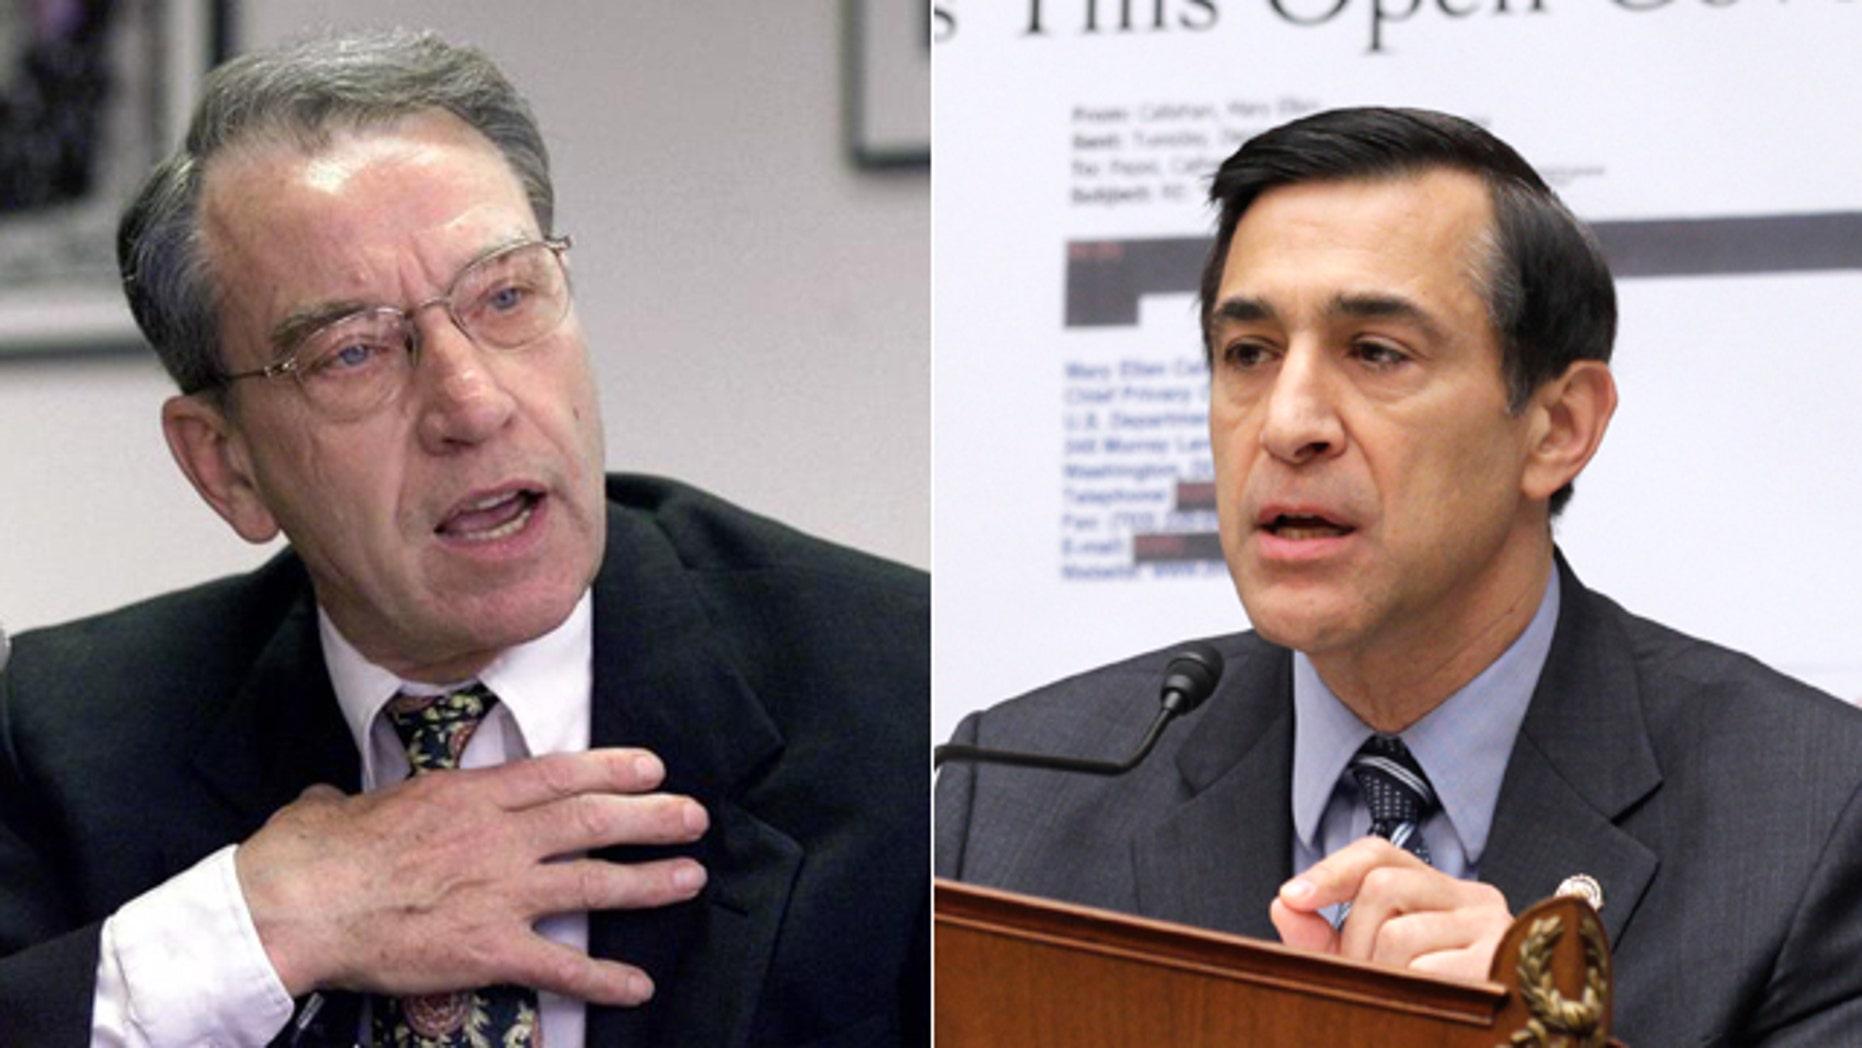 Sen. Charles Grassley, left, and Rep. Darrell Issa